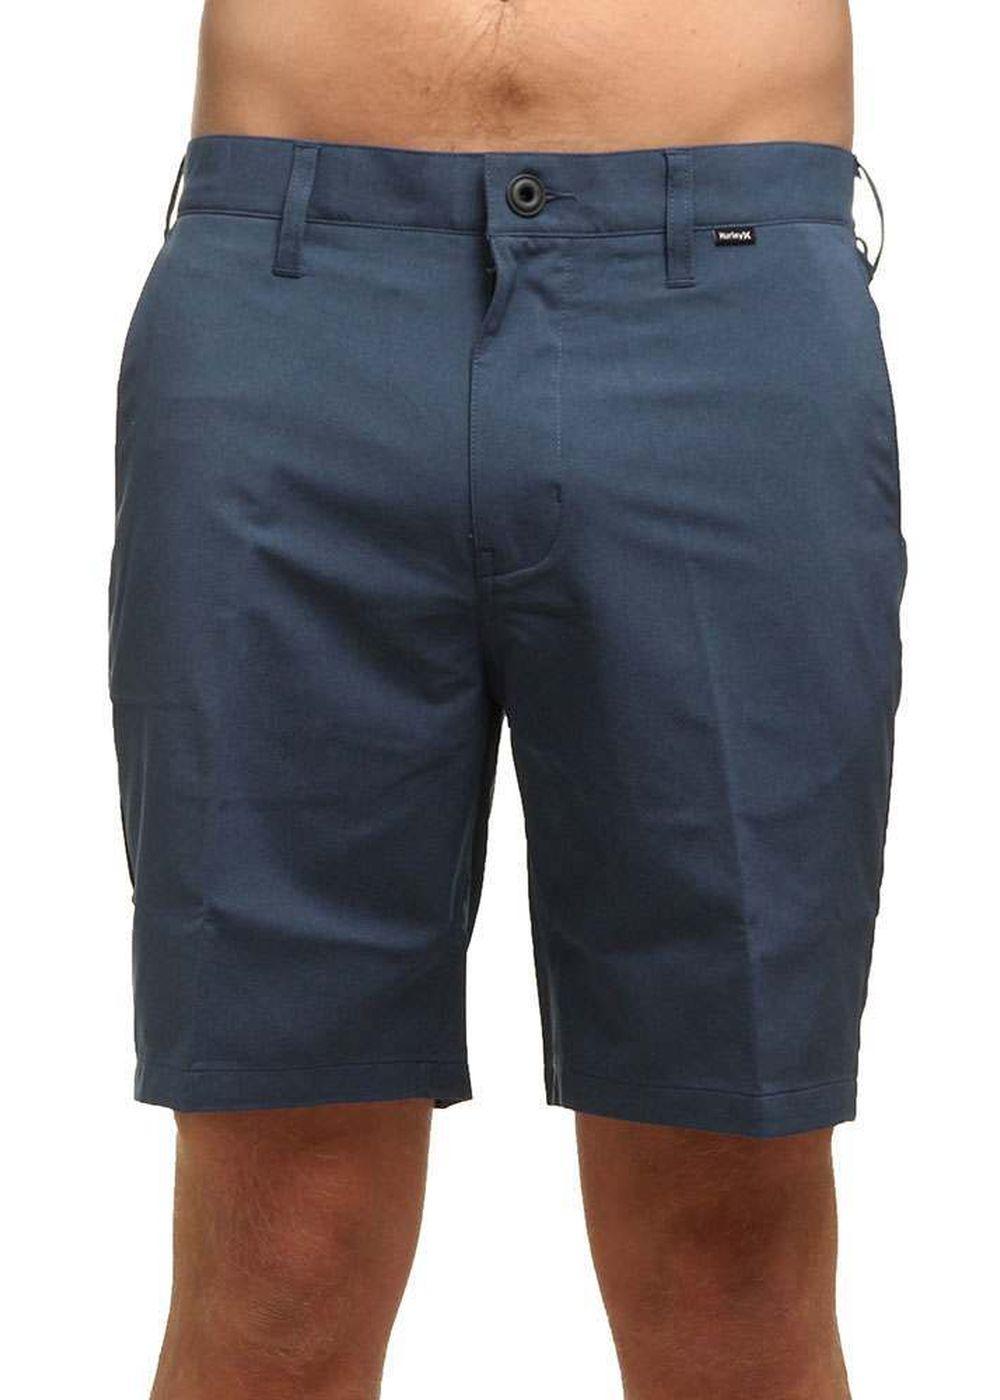 hurley-drifit-heather-shorts-squadron-blue